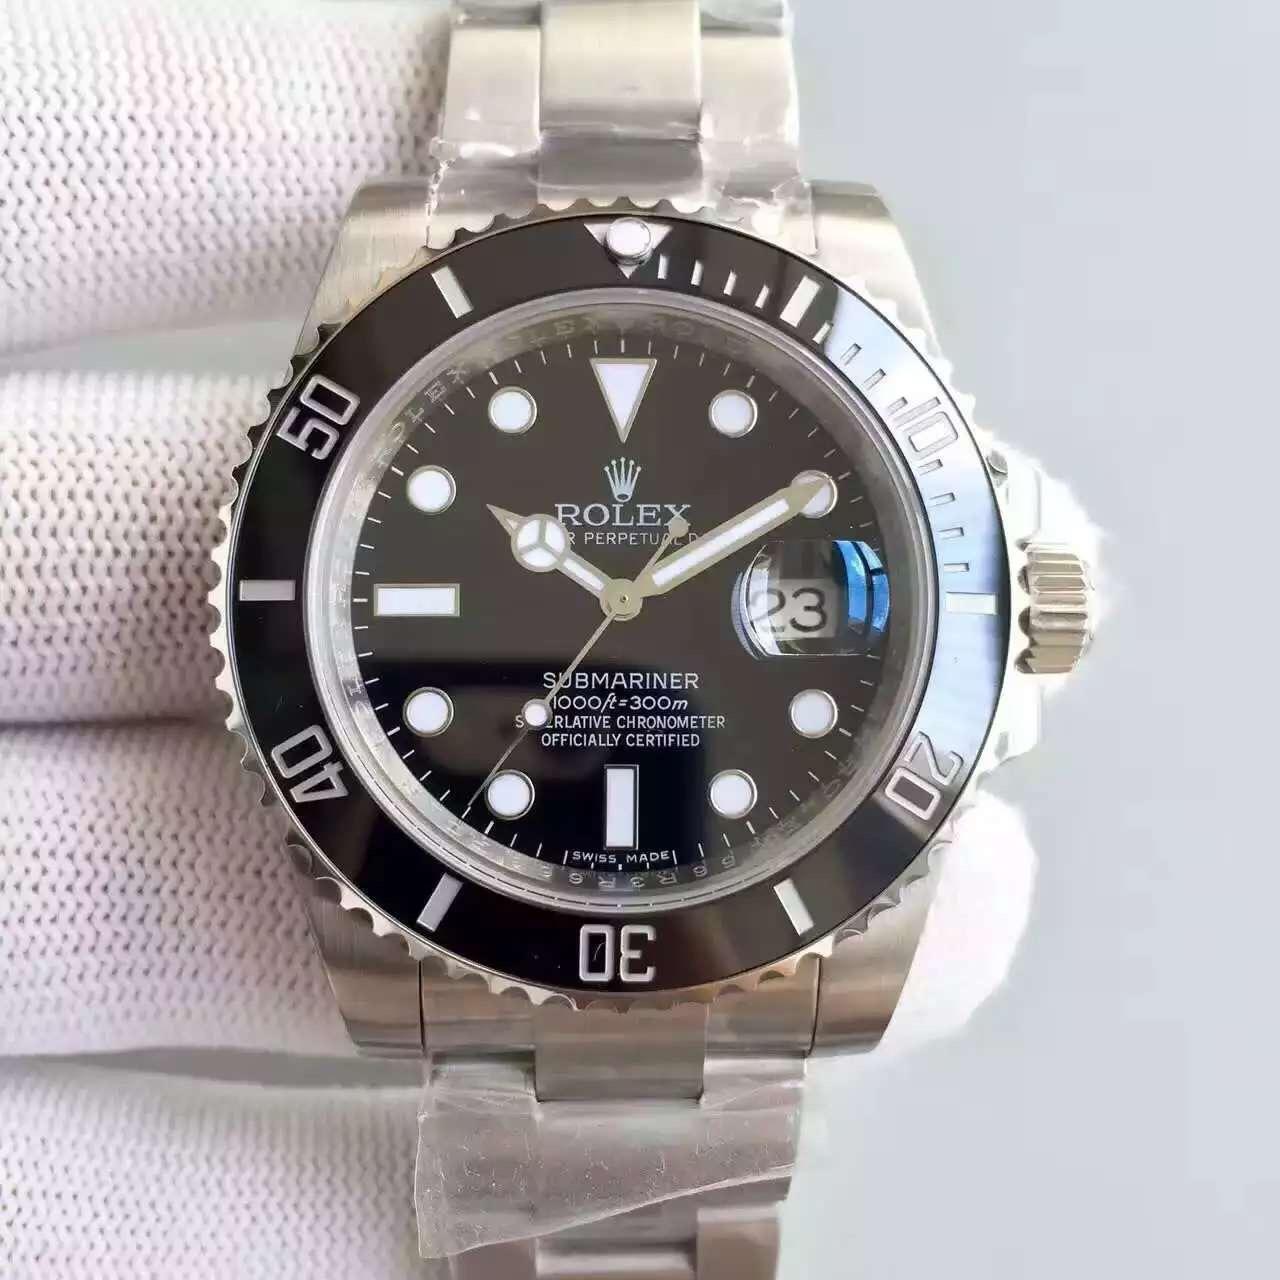 Rolex 勞力士 Submariner 116610LV 116610  LN 116610LN